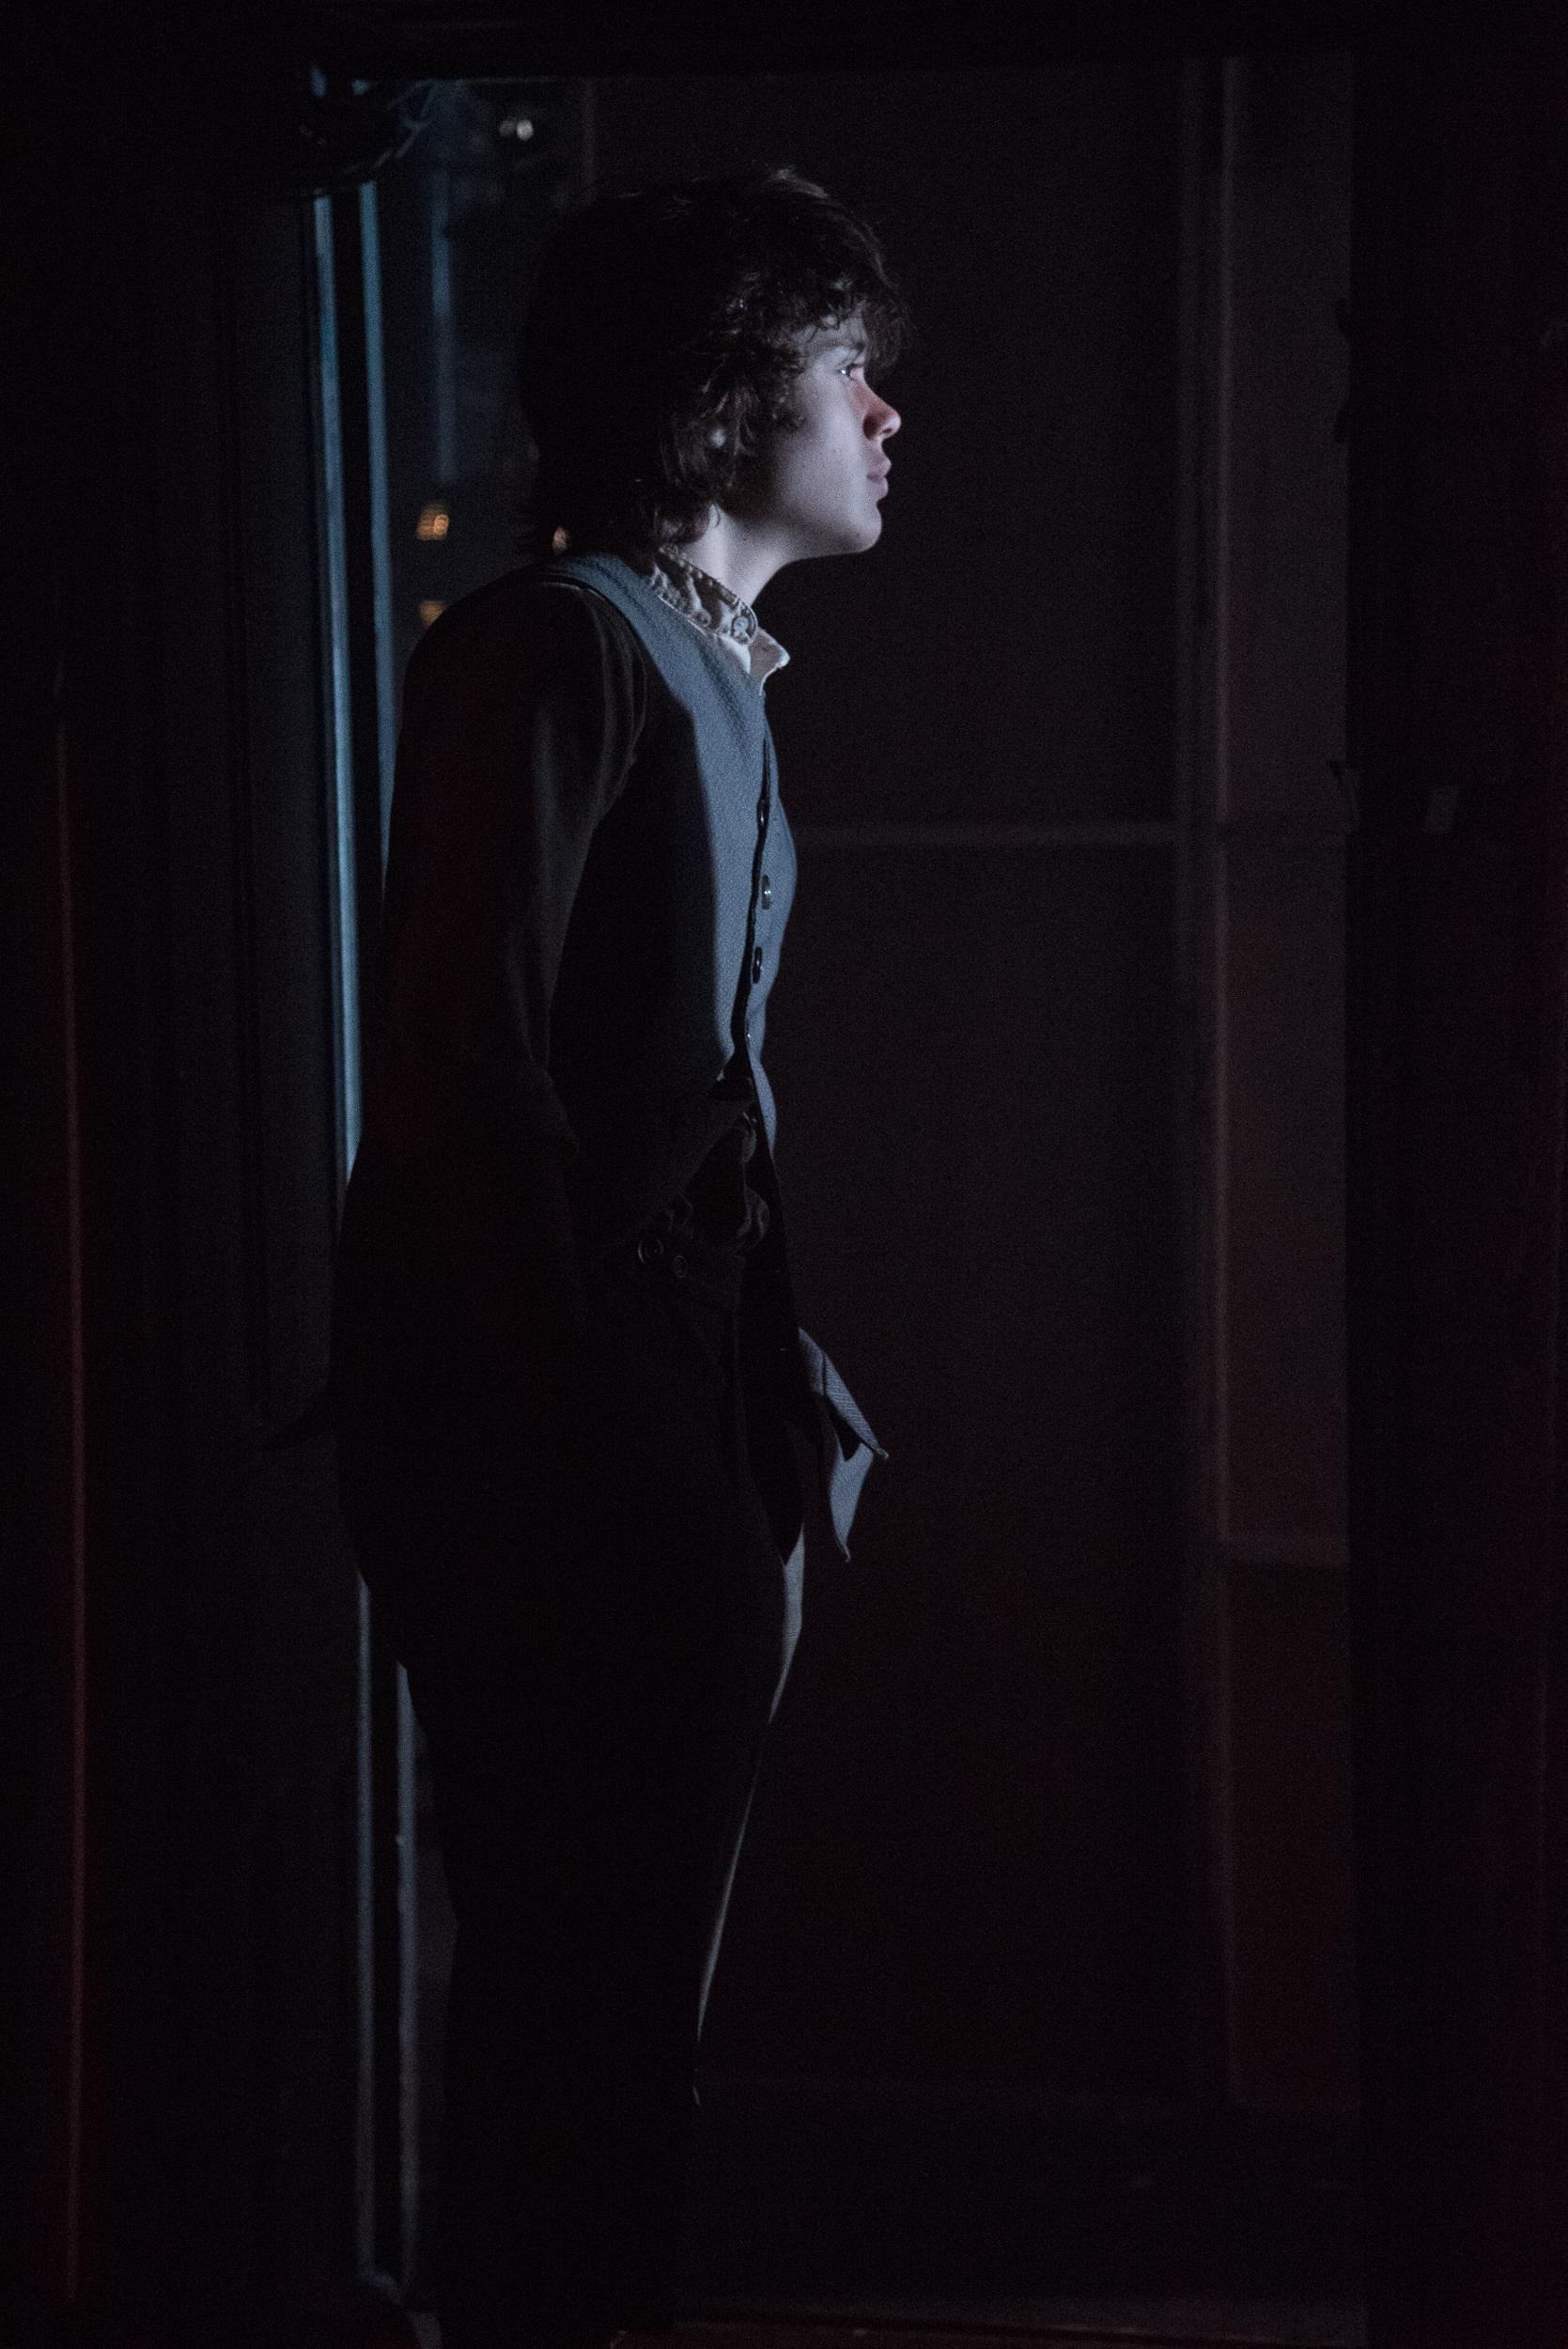 Backstage - 007.jpg